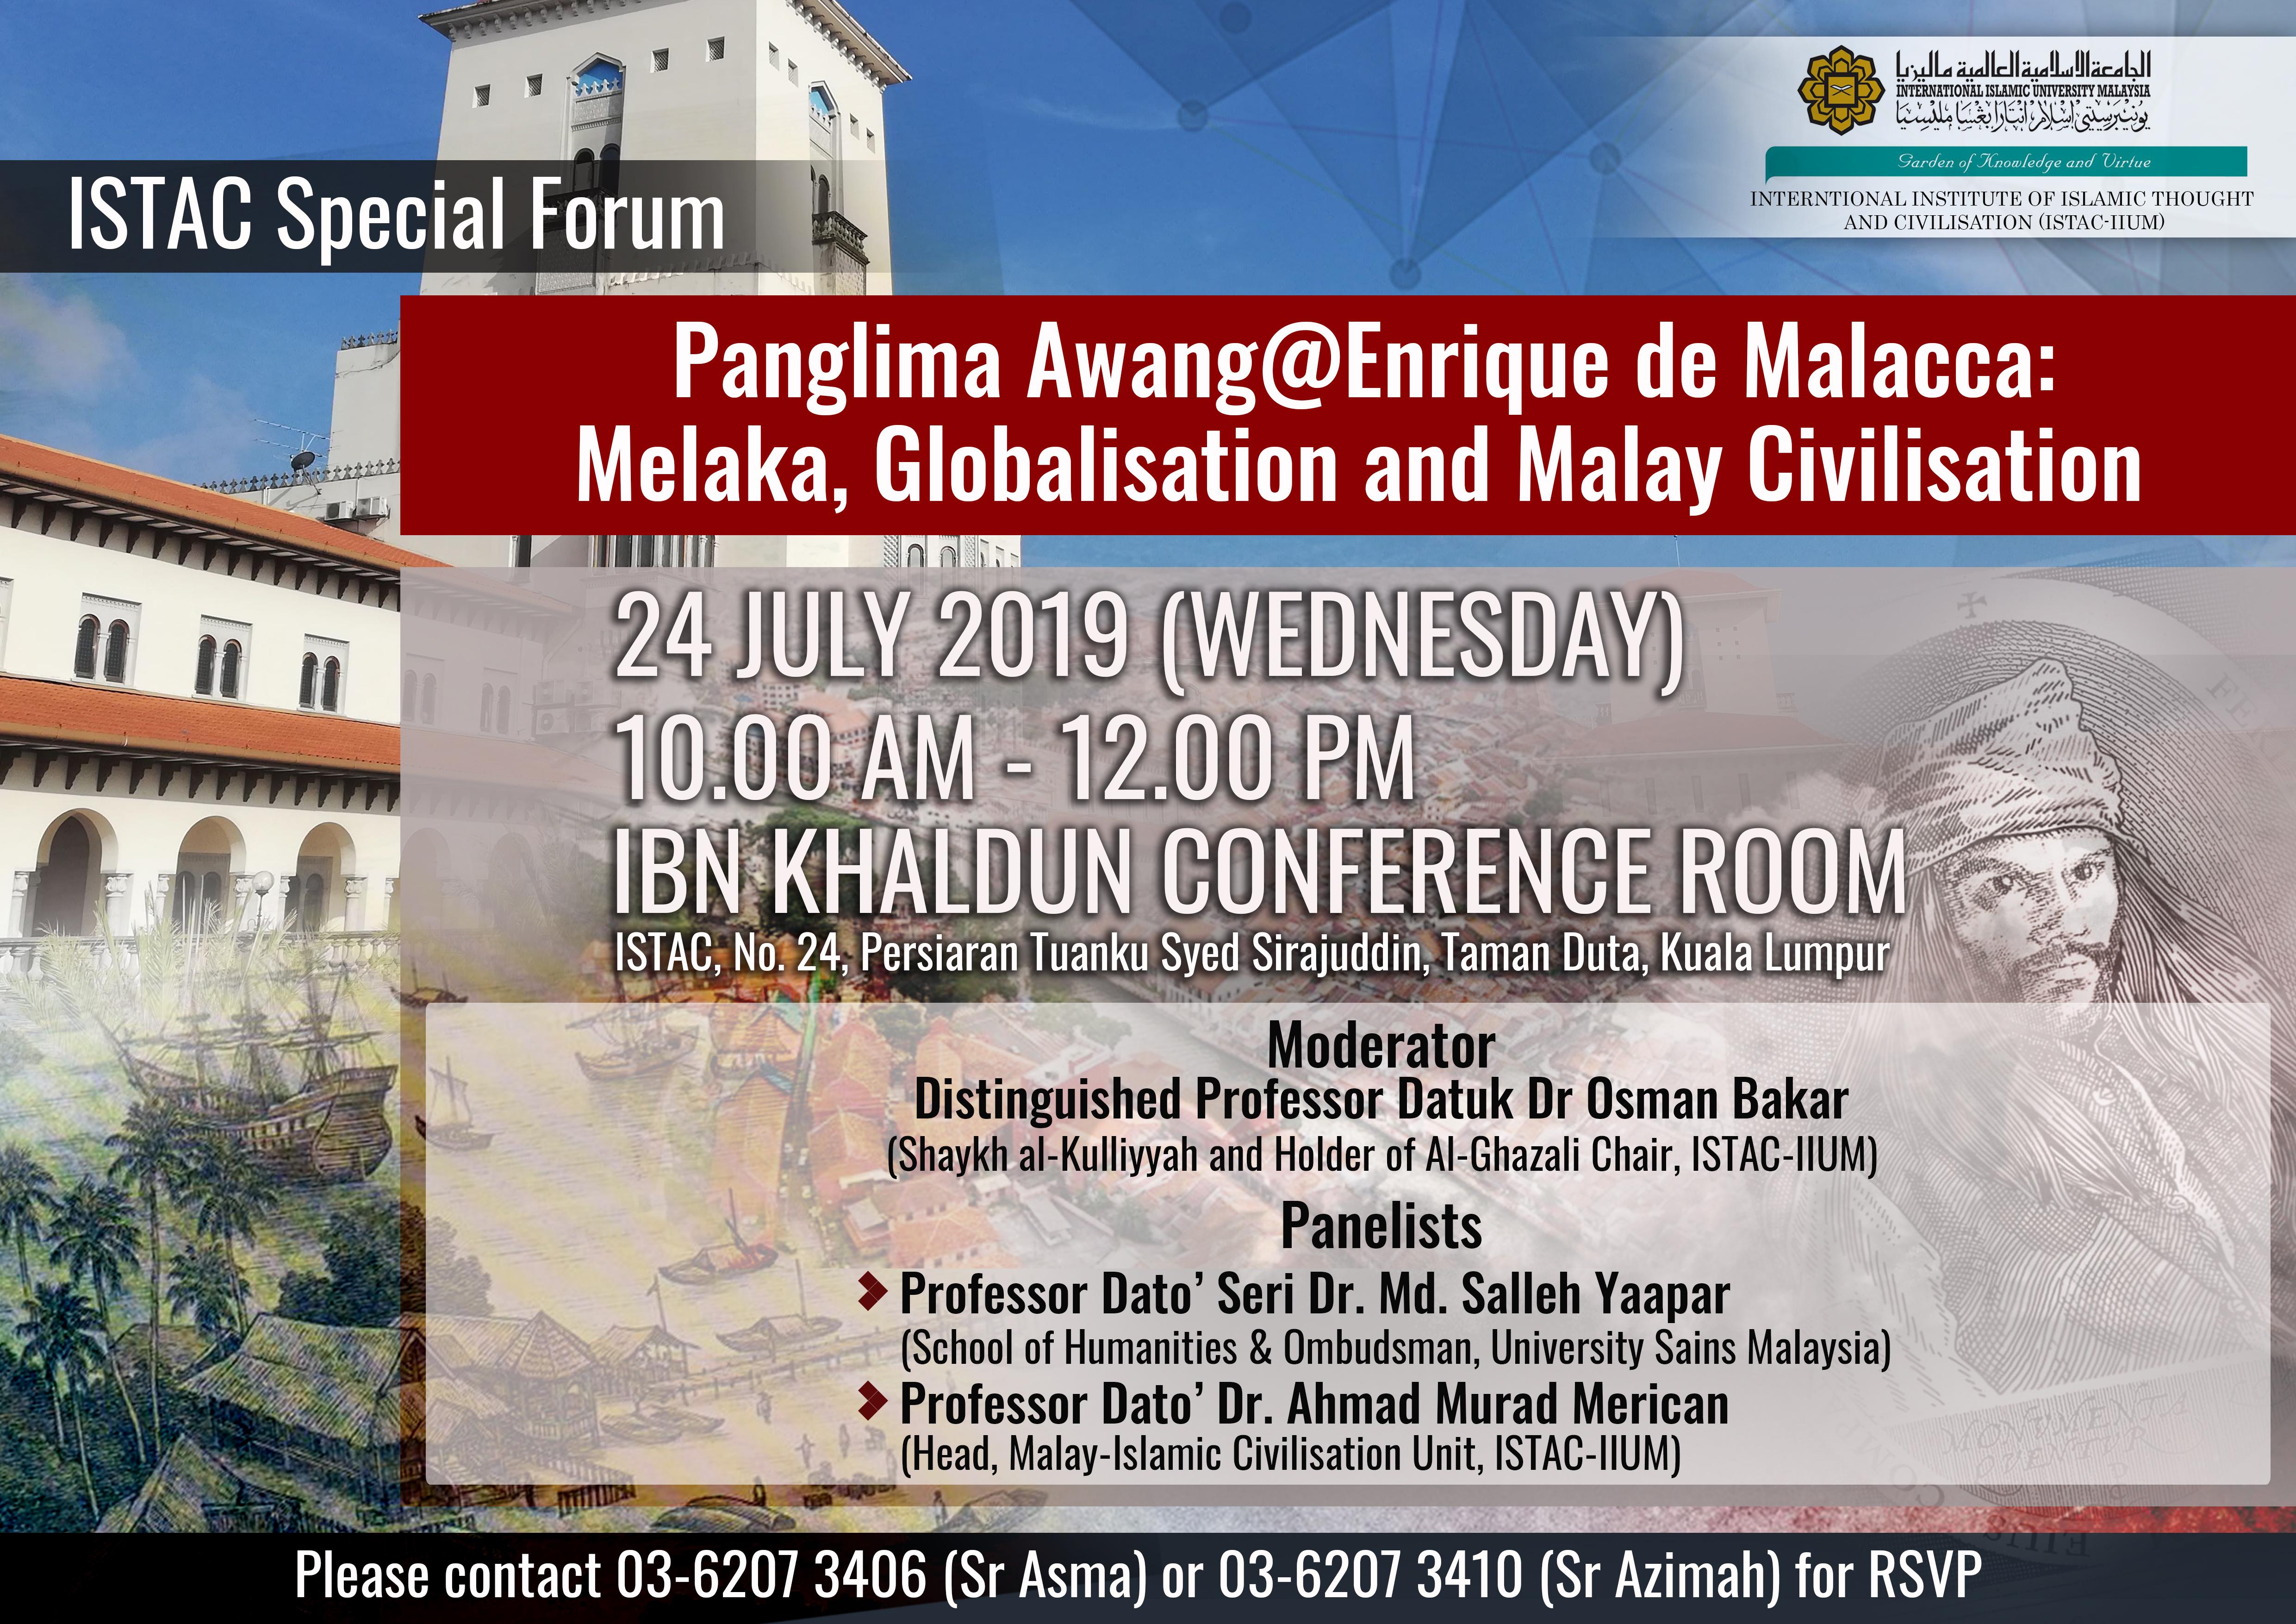 ISTAC SPECIAL FORUM: Panglima Awang@Enrique de Malacca: